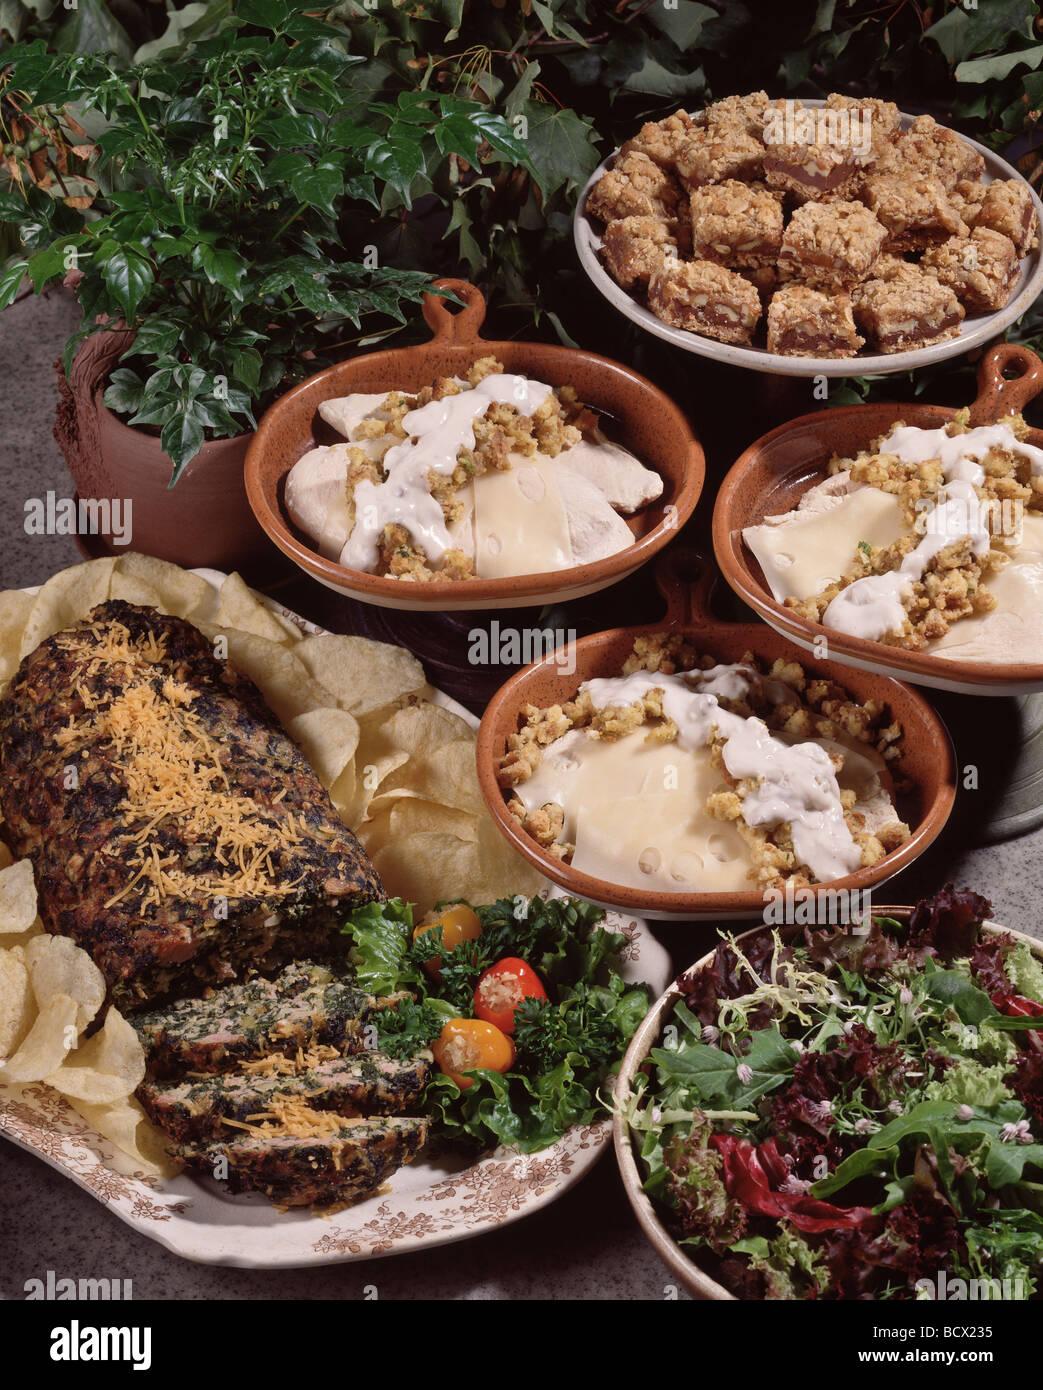 Country Kitchen Recipes Potato Chip Spinach Loaf En Supreme Caramel Squares Dessert